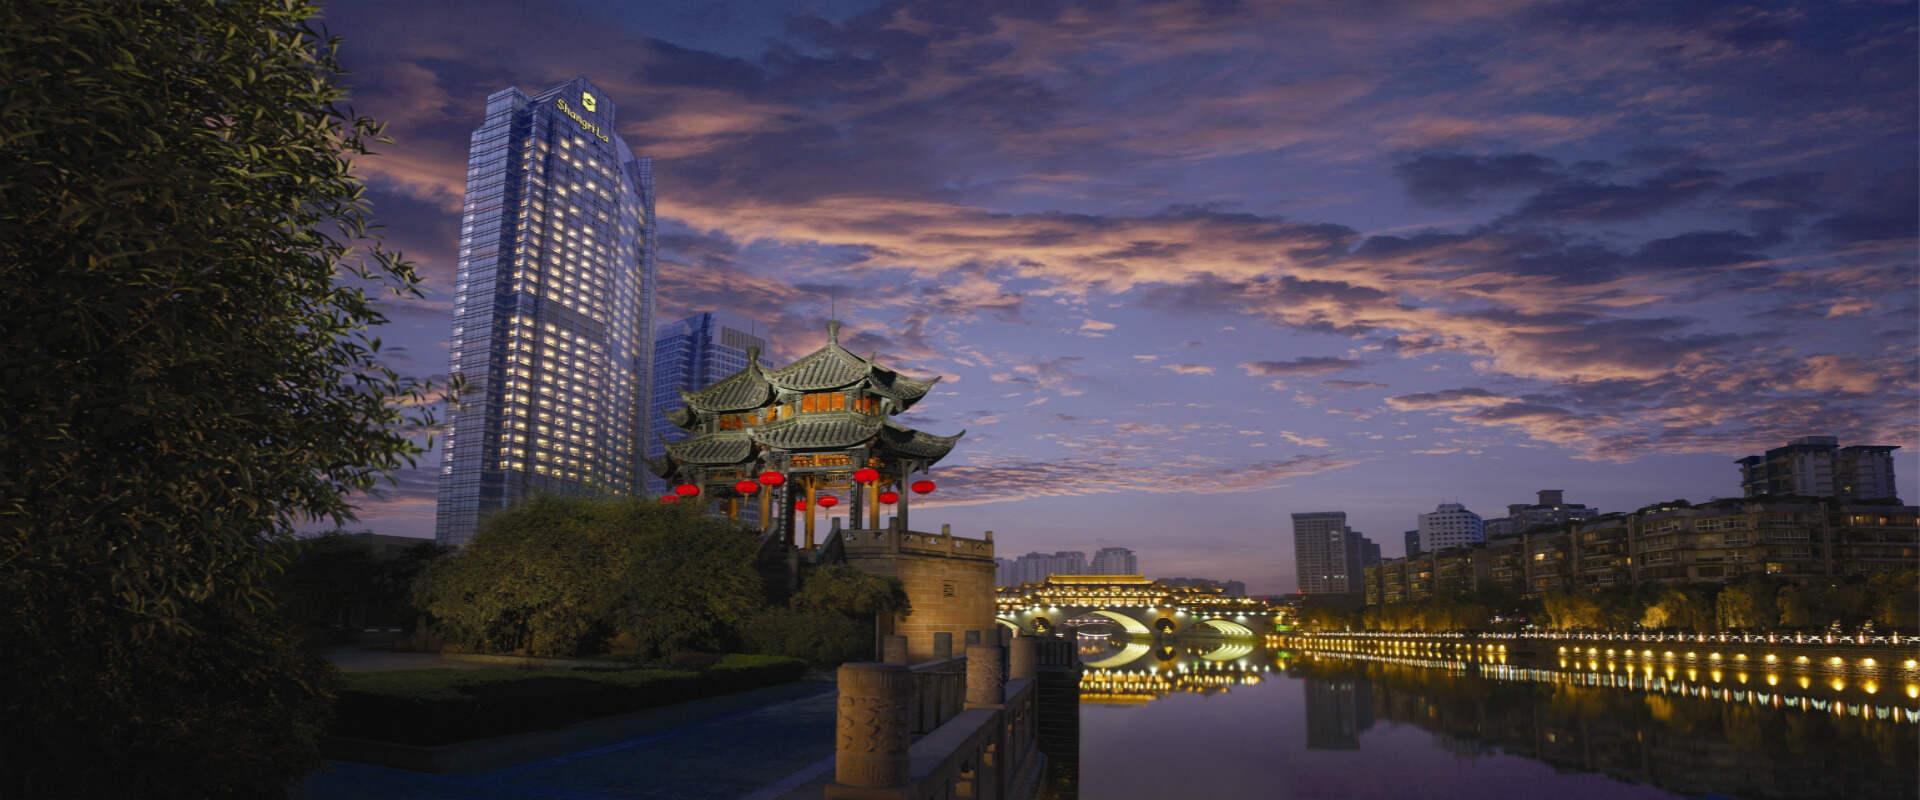 Hong Kong expat dating hem sida